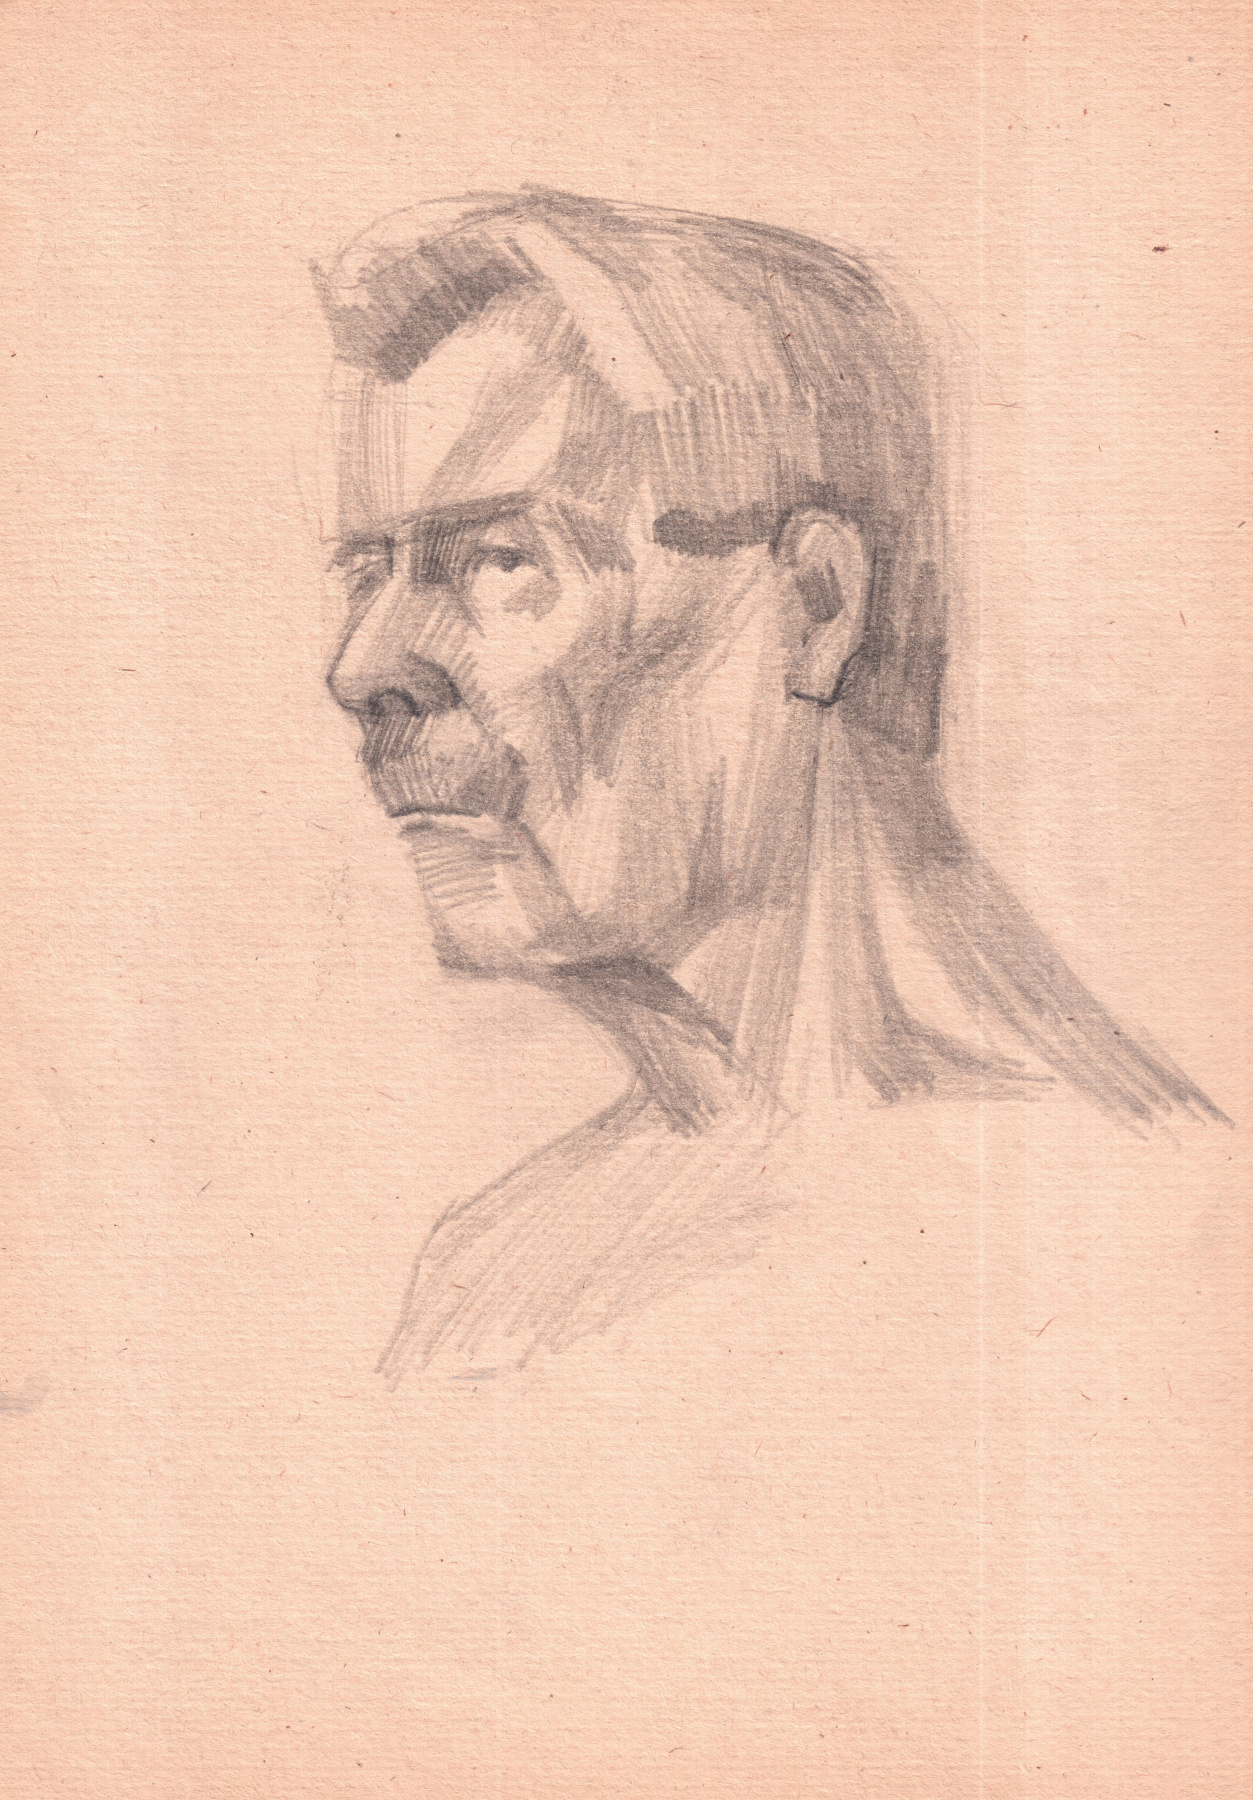 Arkady Pavlovich Laptev. Sketch of the elderly man